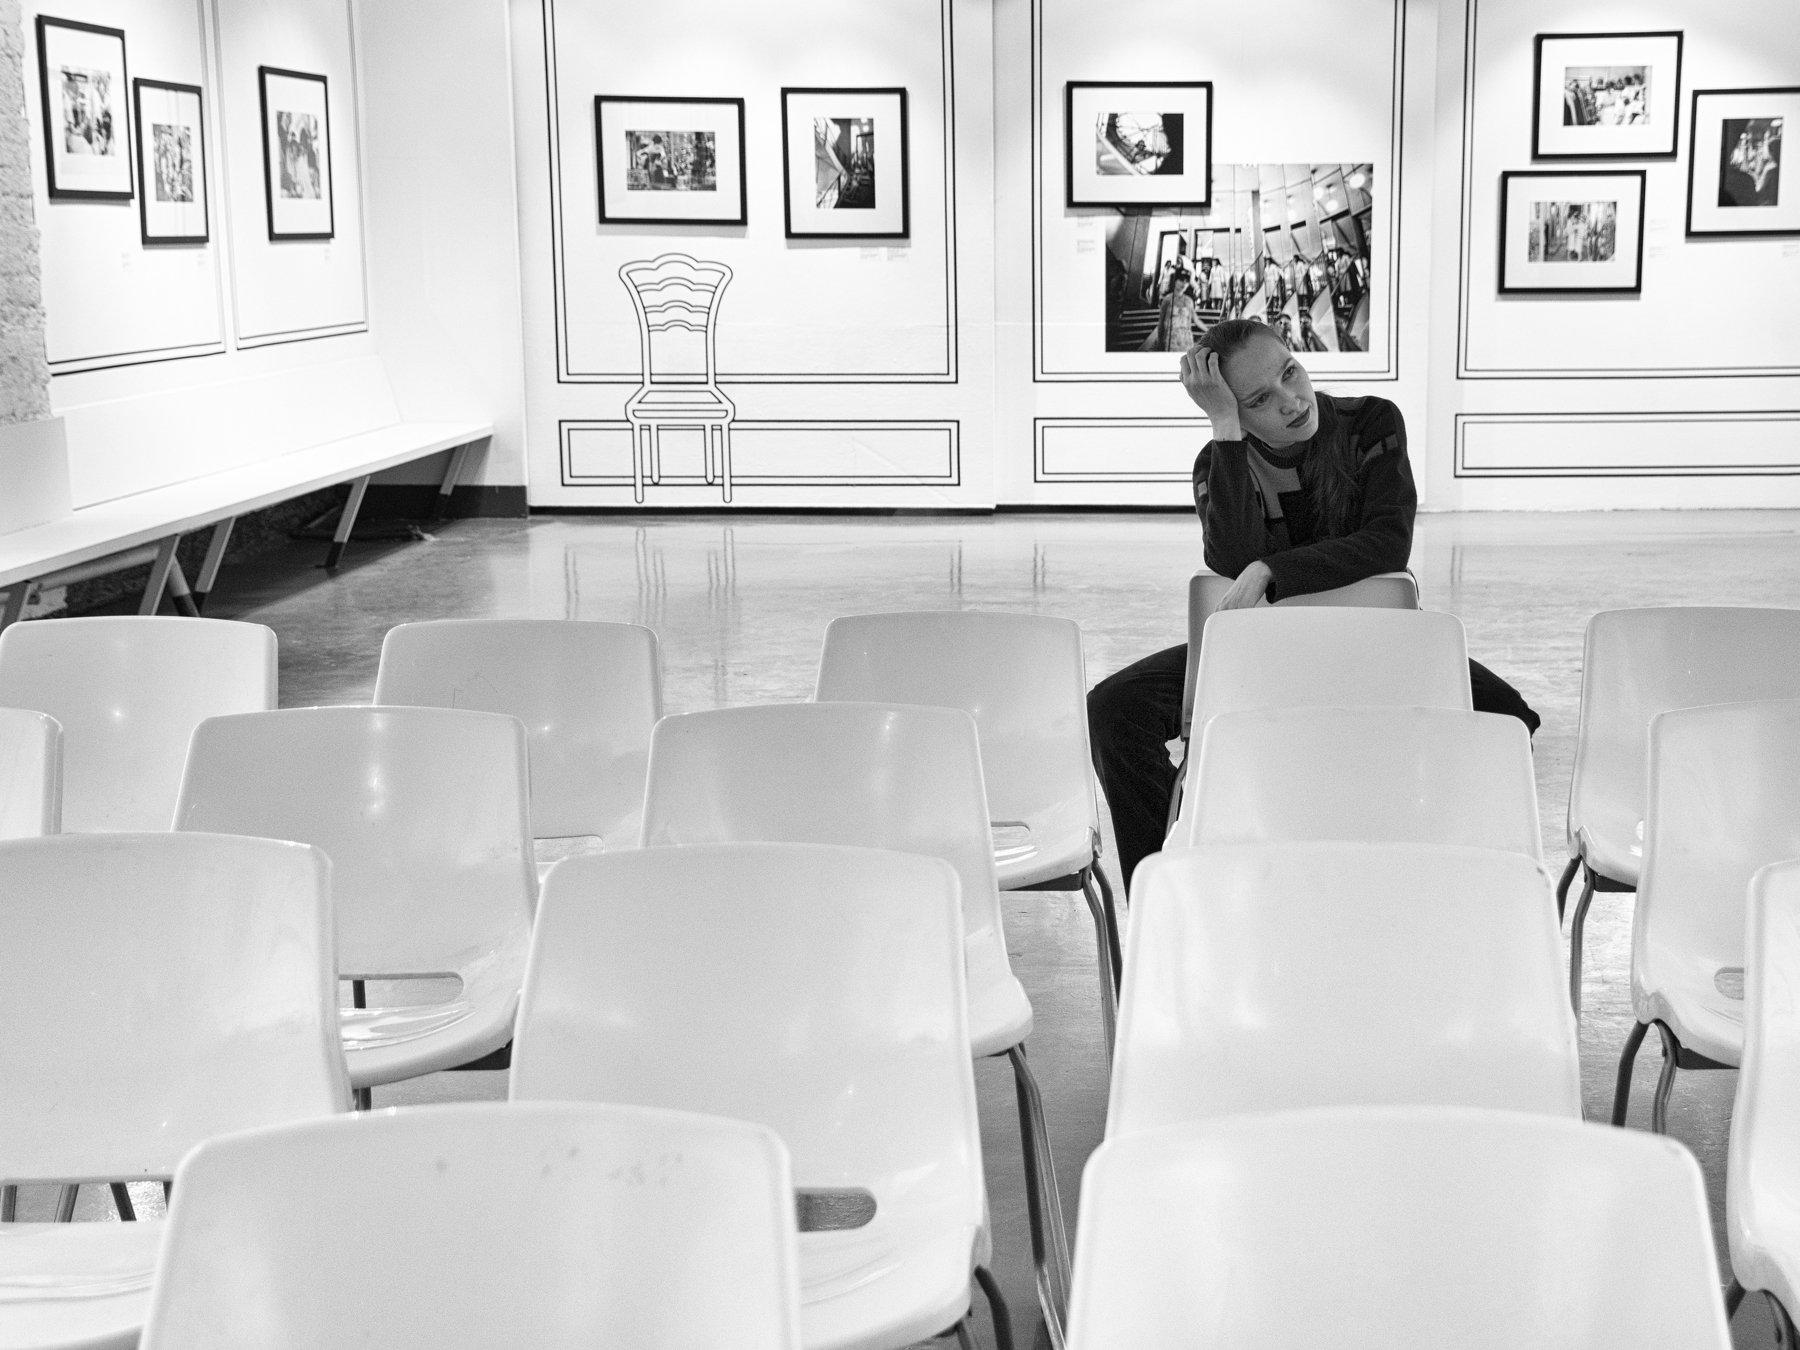 Girl, Moscow, Russia, Monochrome, Exibition, Black and white, Thinking, Elena Beregatnova